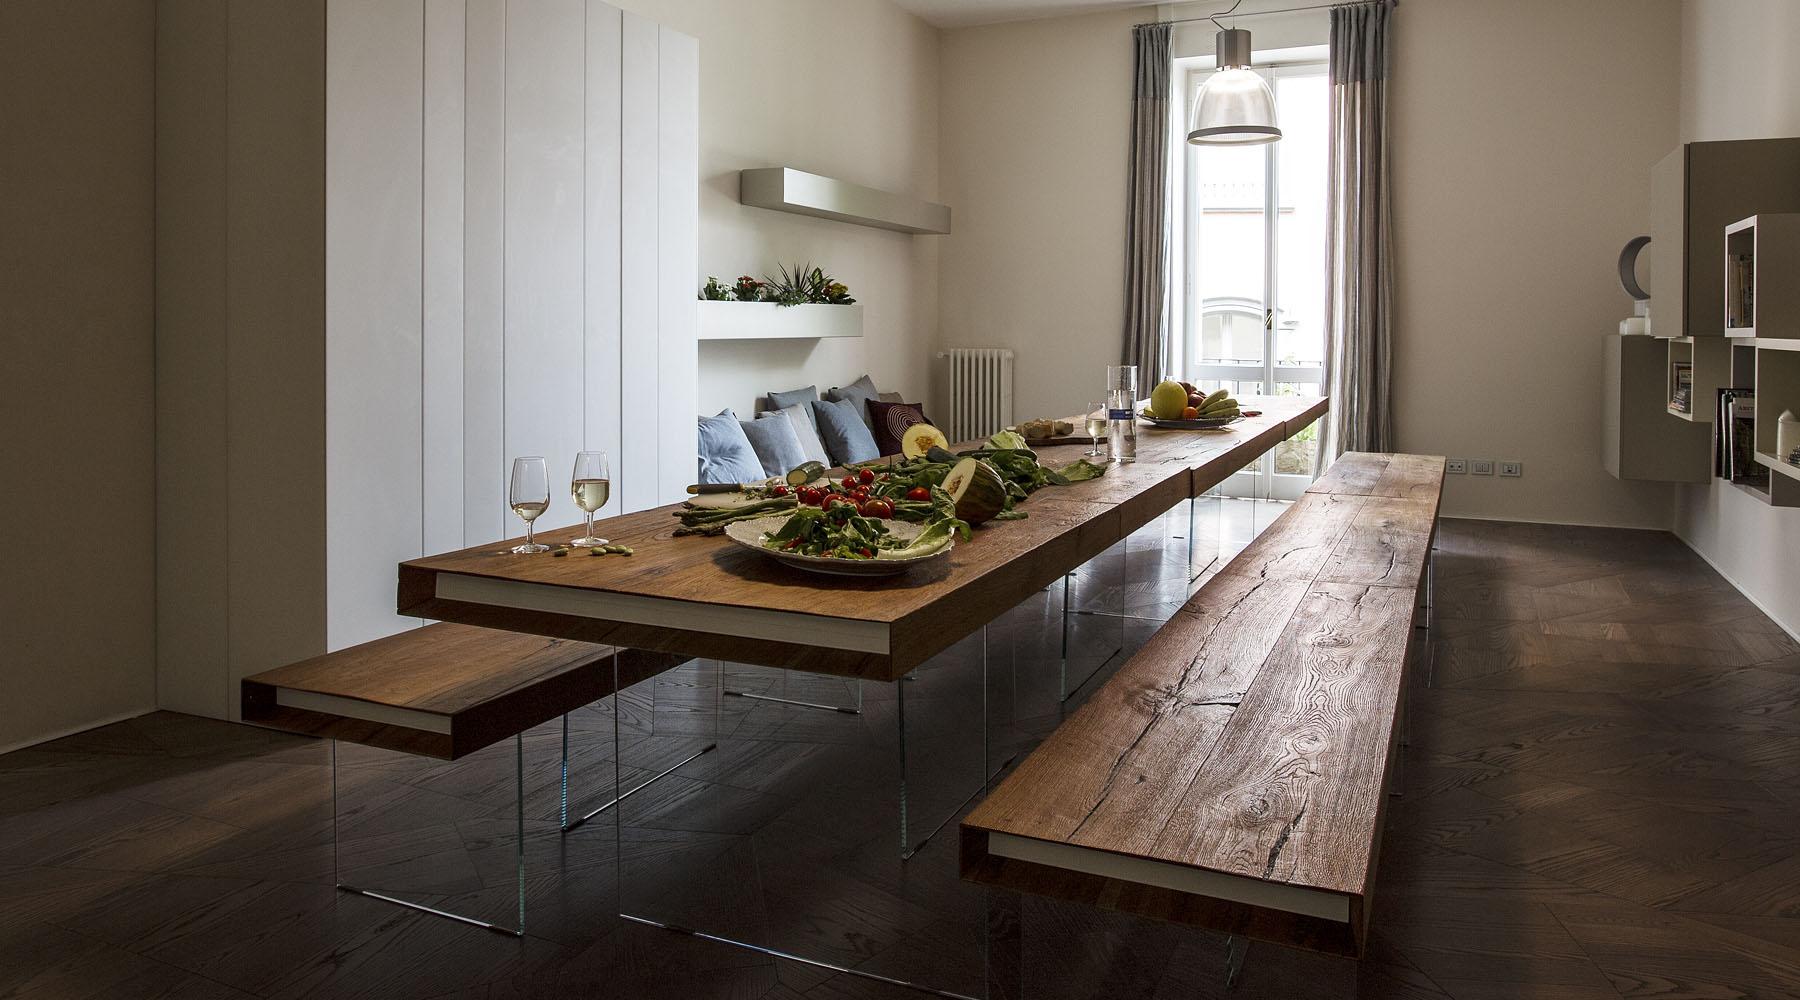 Panca E Tavolo Da Cucina : Tavolo e panche air wildwood spazio soluzioni